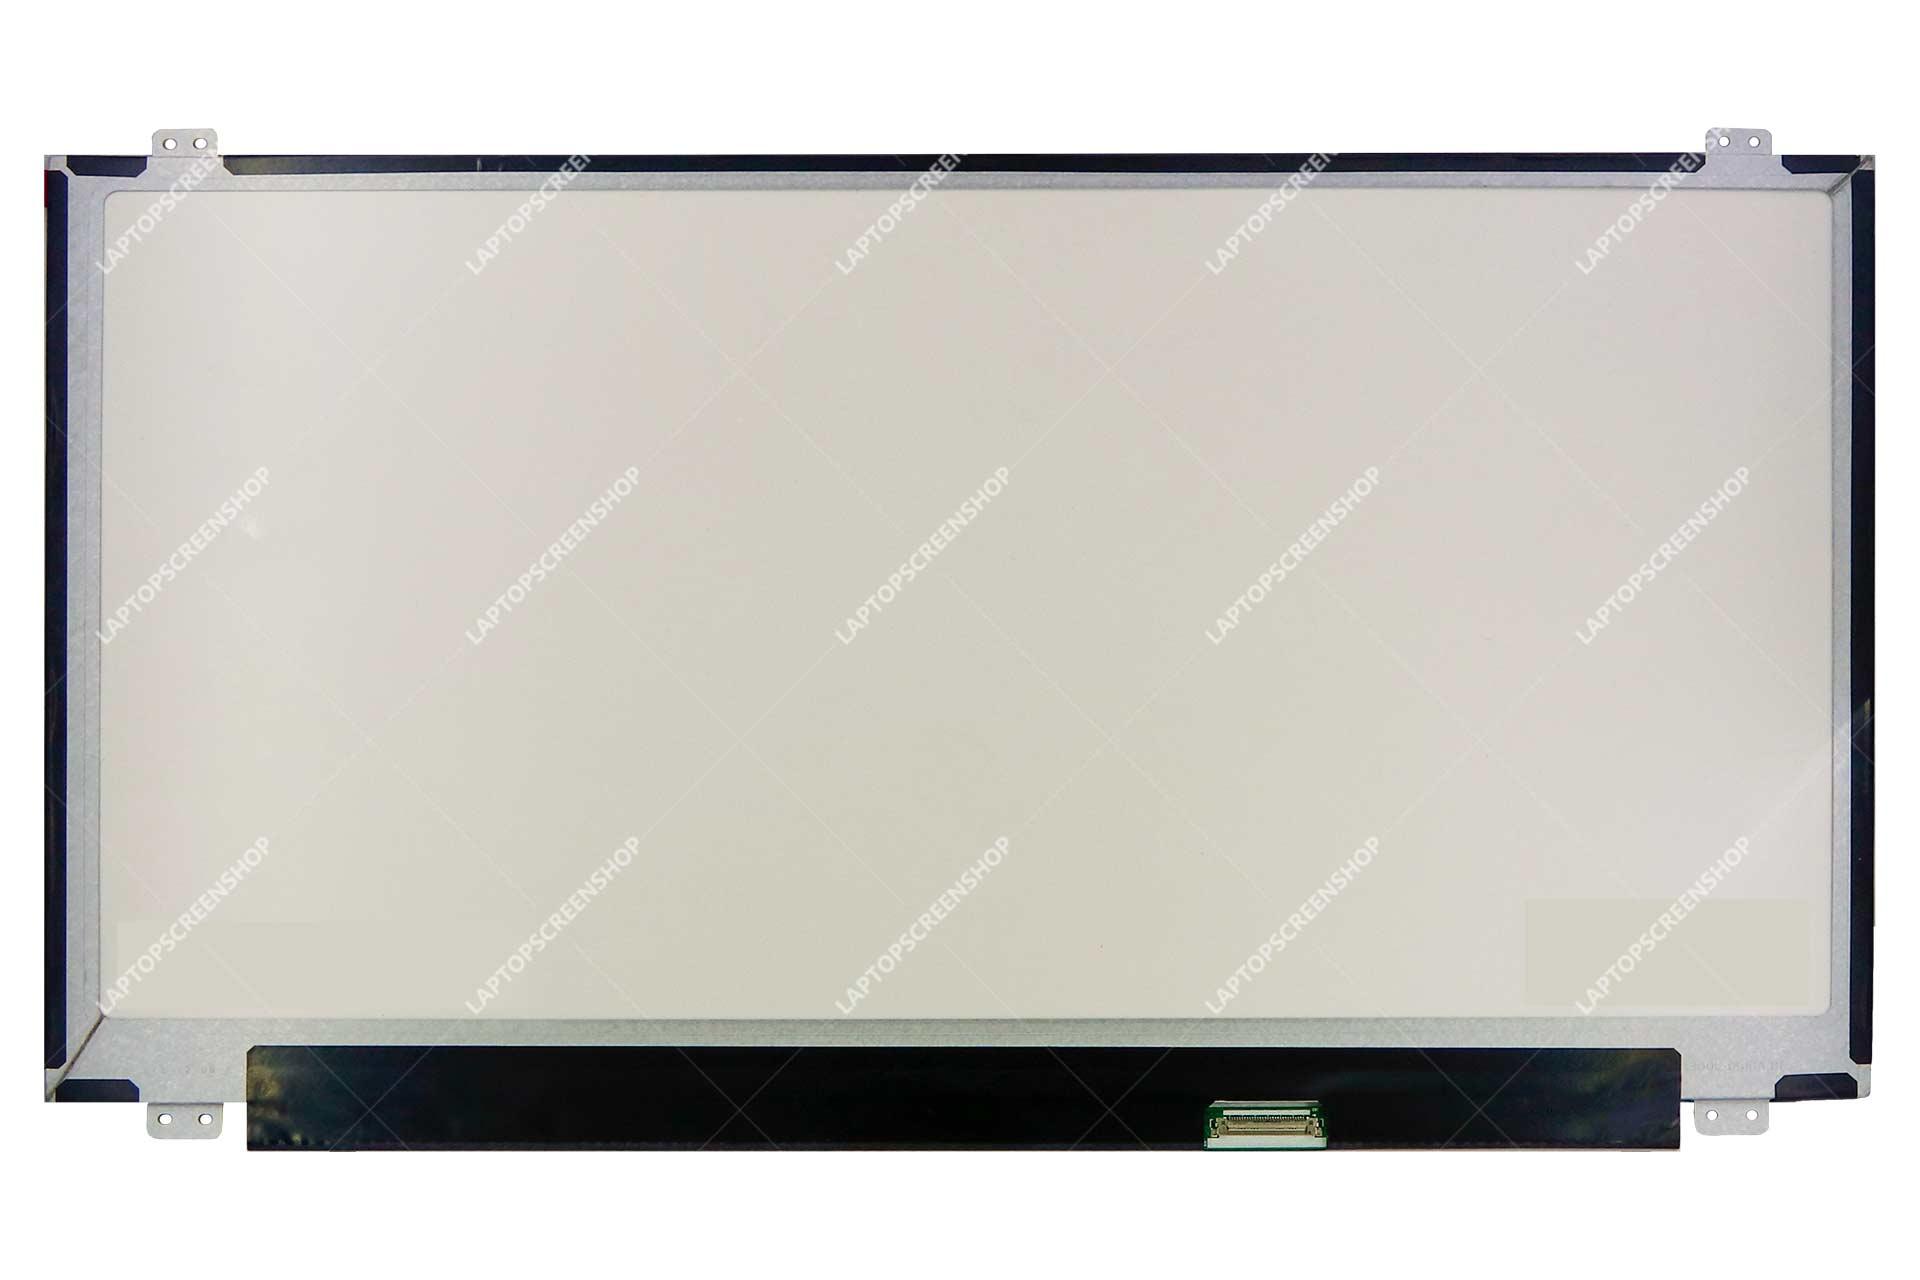 ACER-ASPIRE-E1-470- SERIES-LCD-LCD |HD|فروشگاه لپ تاپ اسکرين | تعمير لپ تاپ